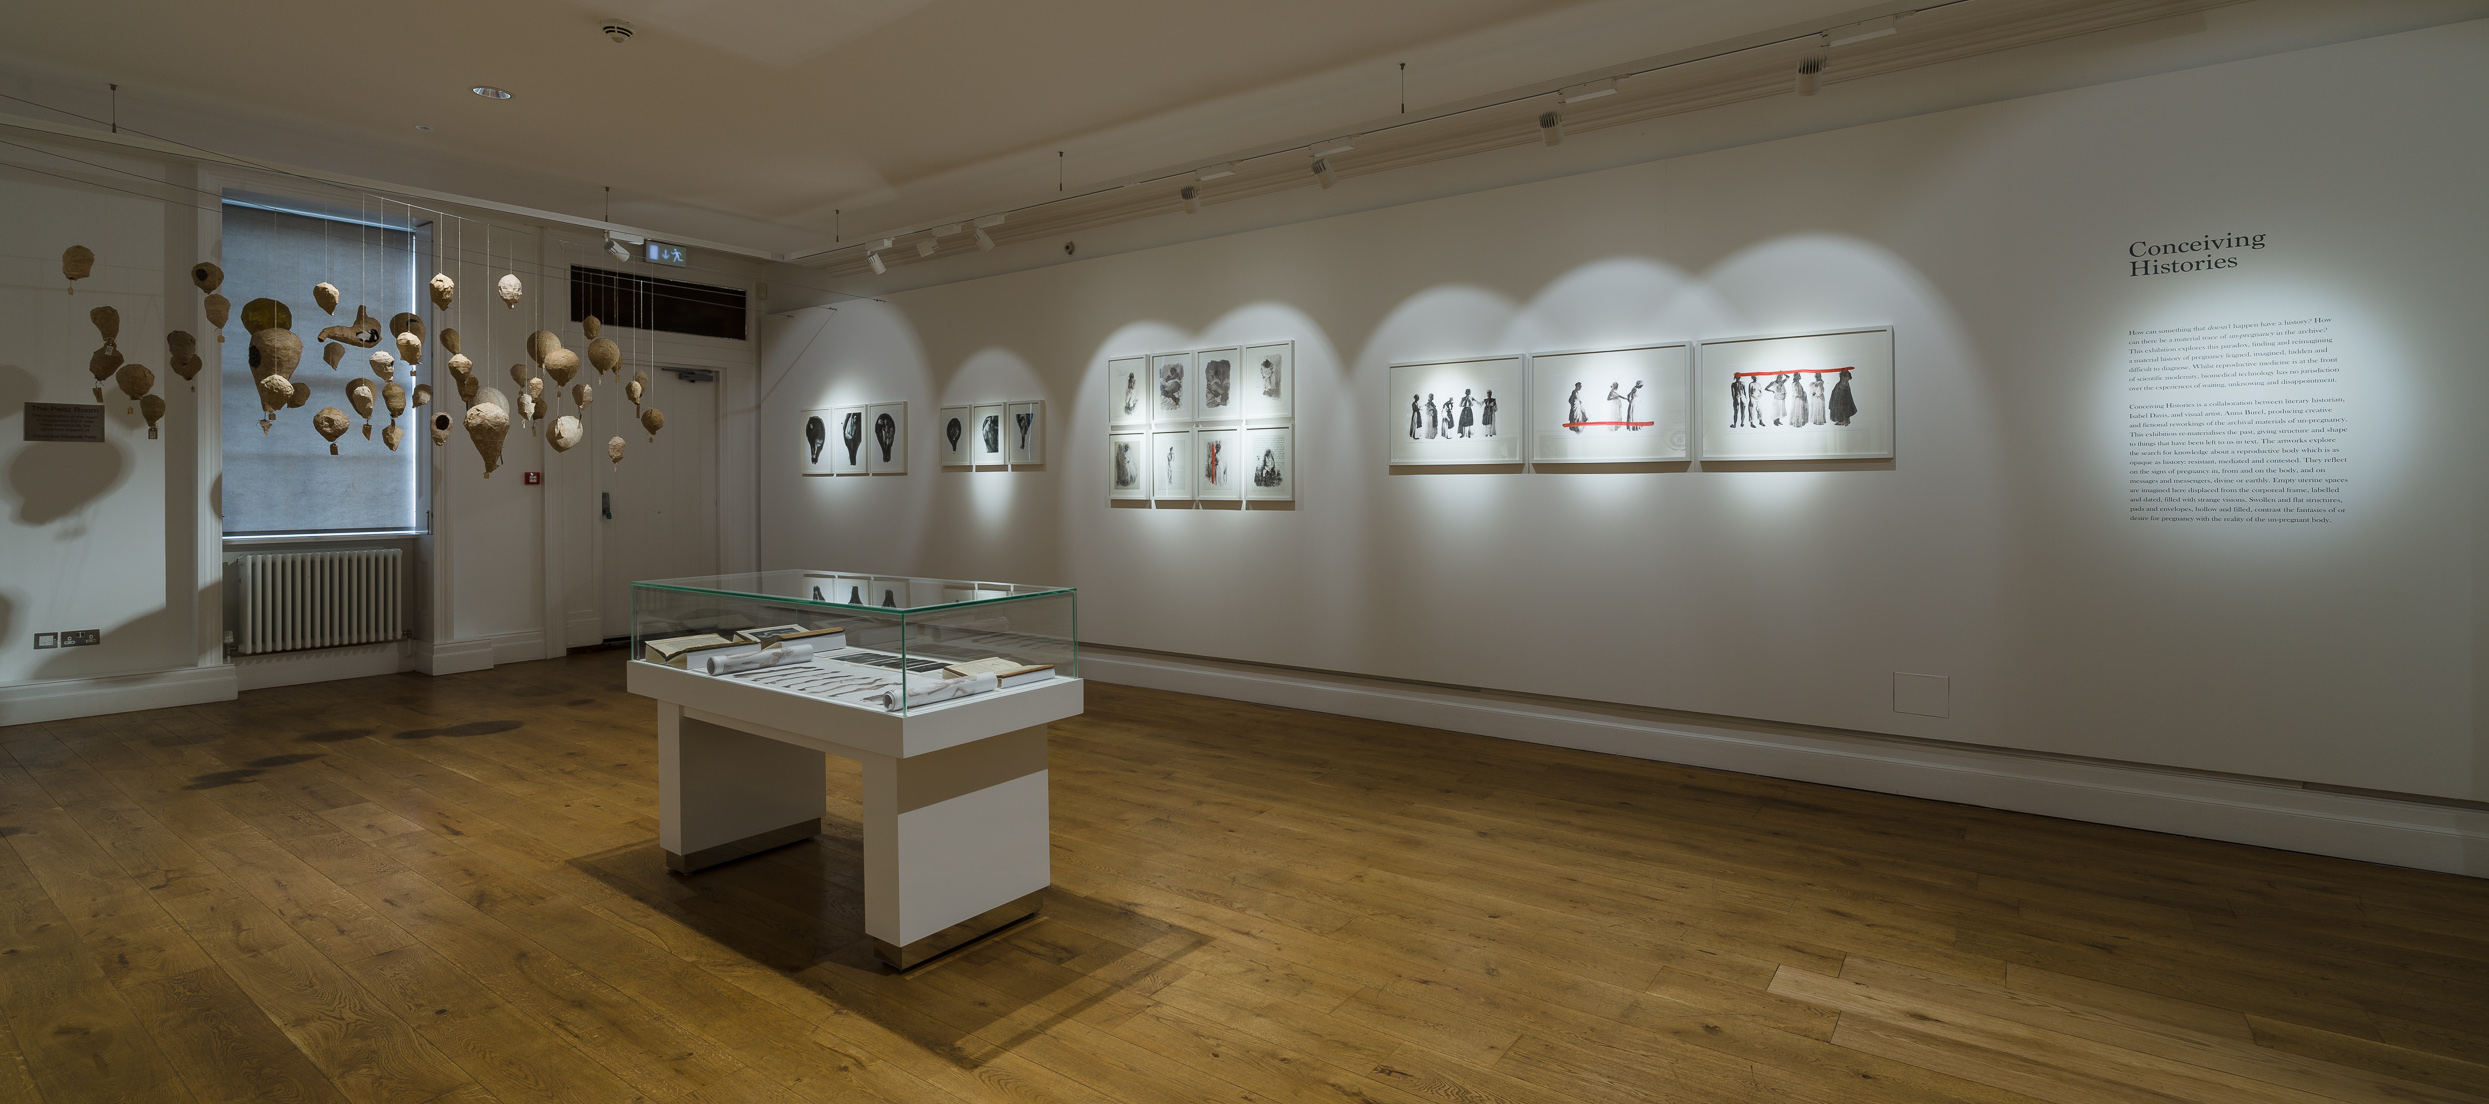 Conceiving Histories exhibition, Peltz Gallery, London, November 2017